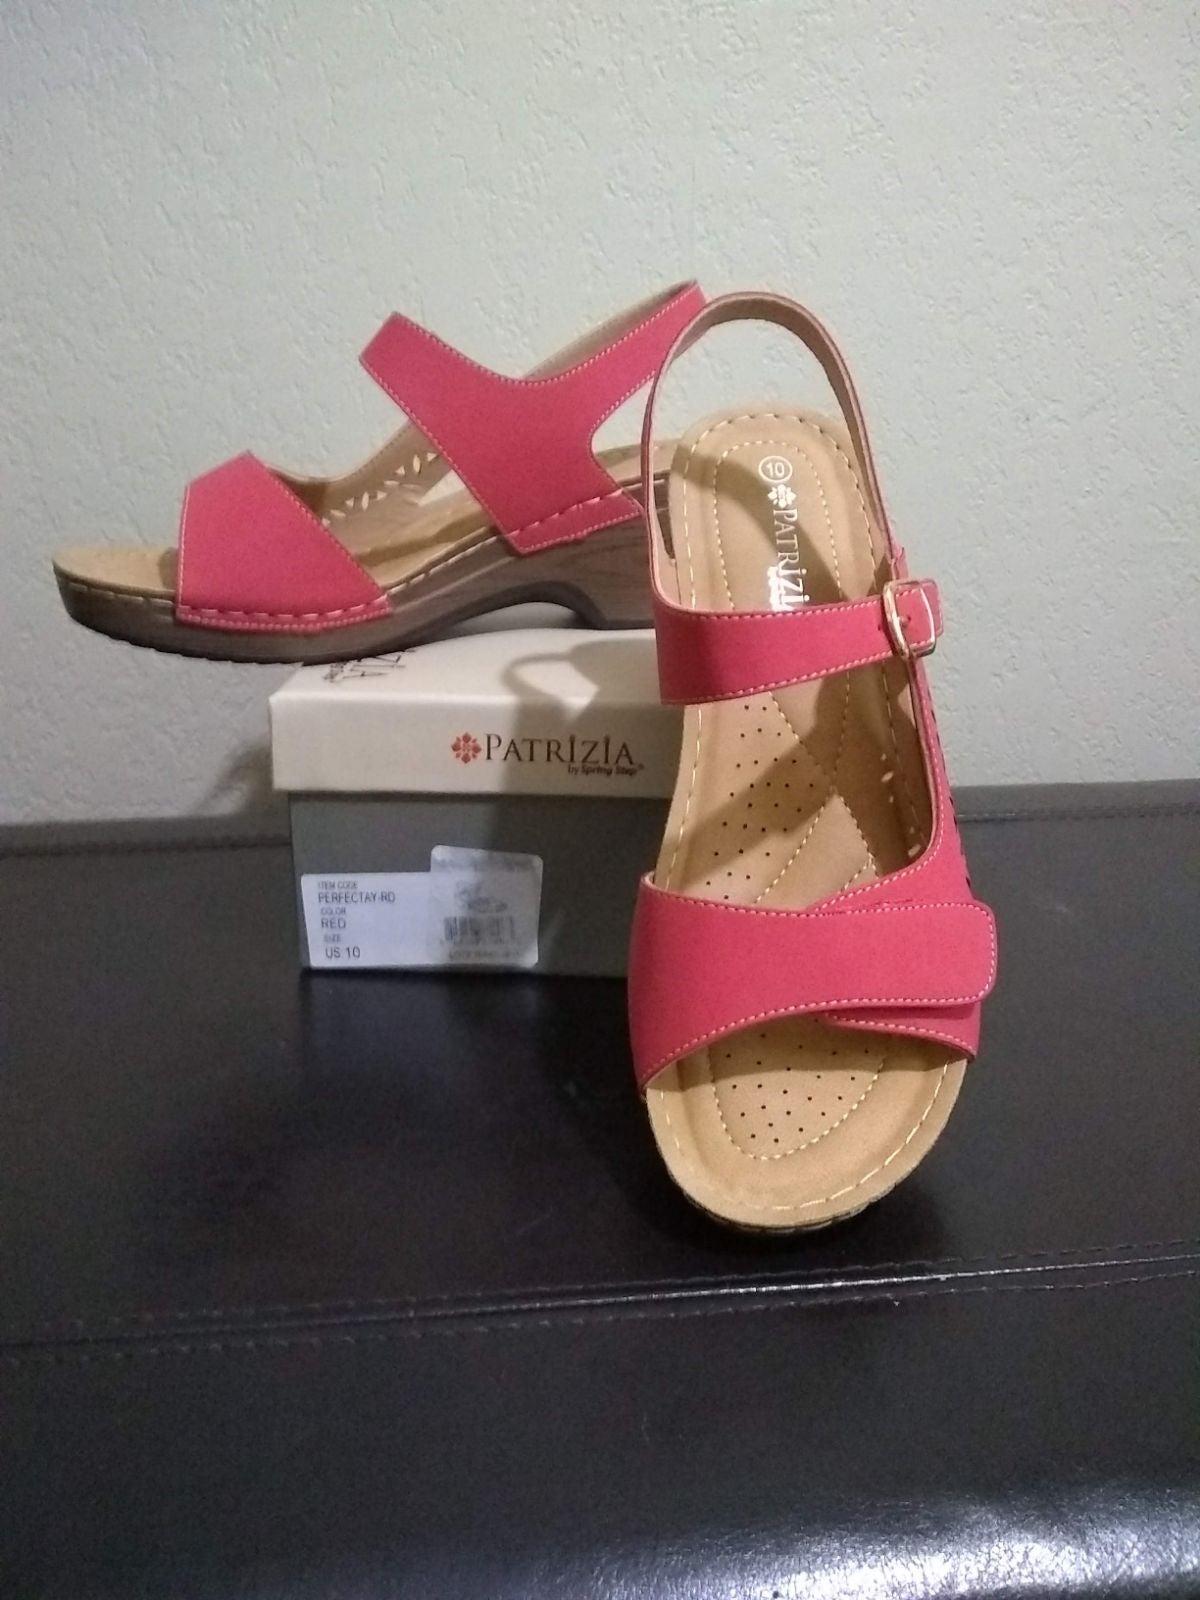 Patrizia size 10 Red Platform Sandals